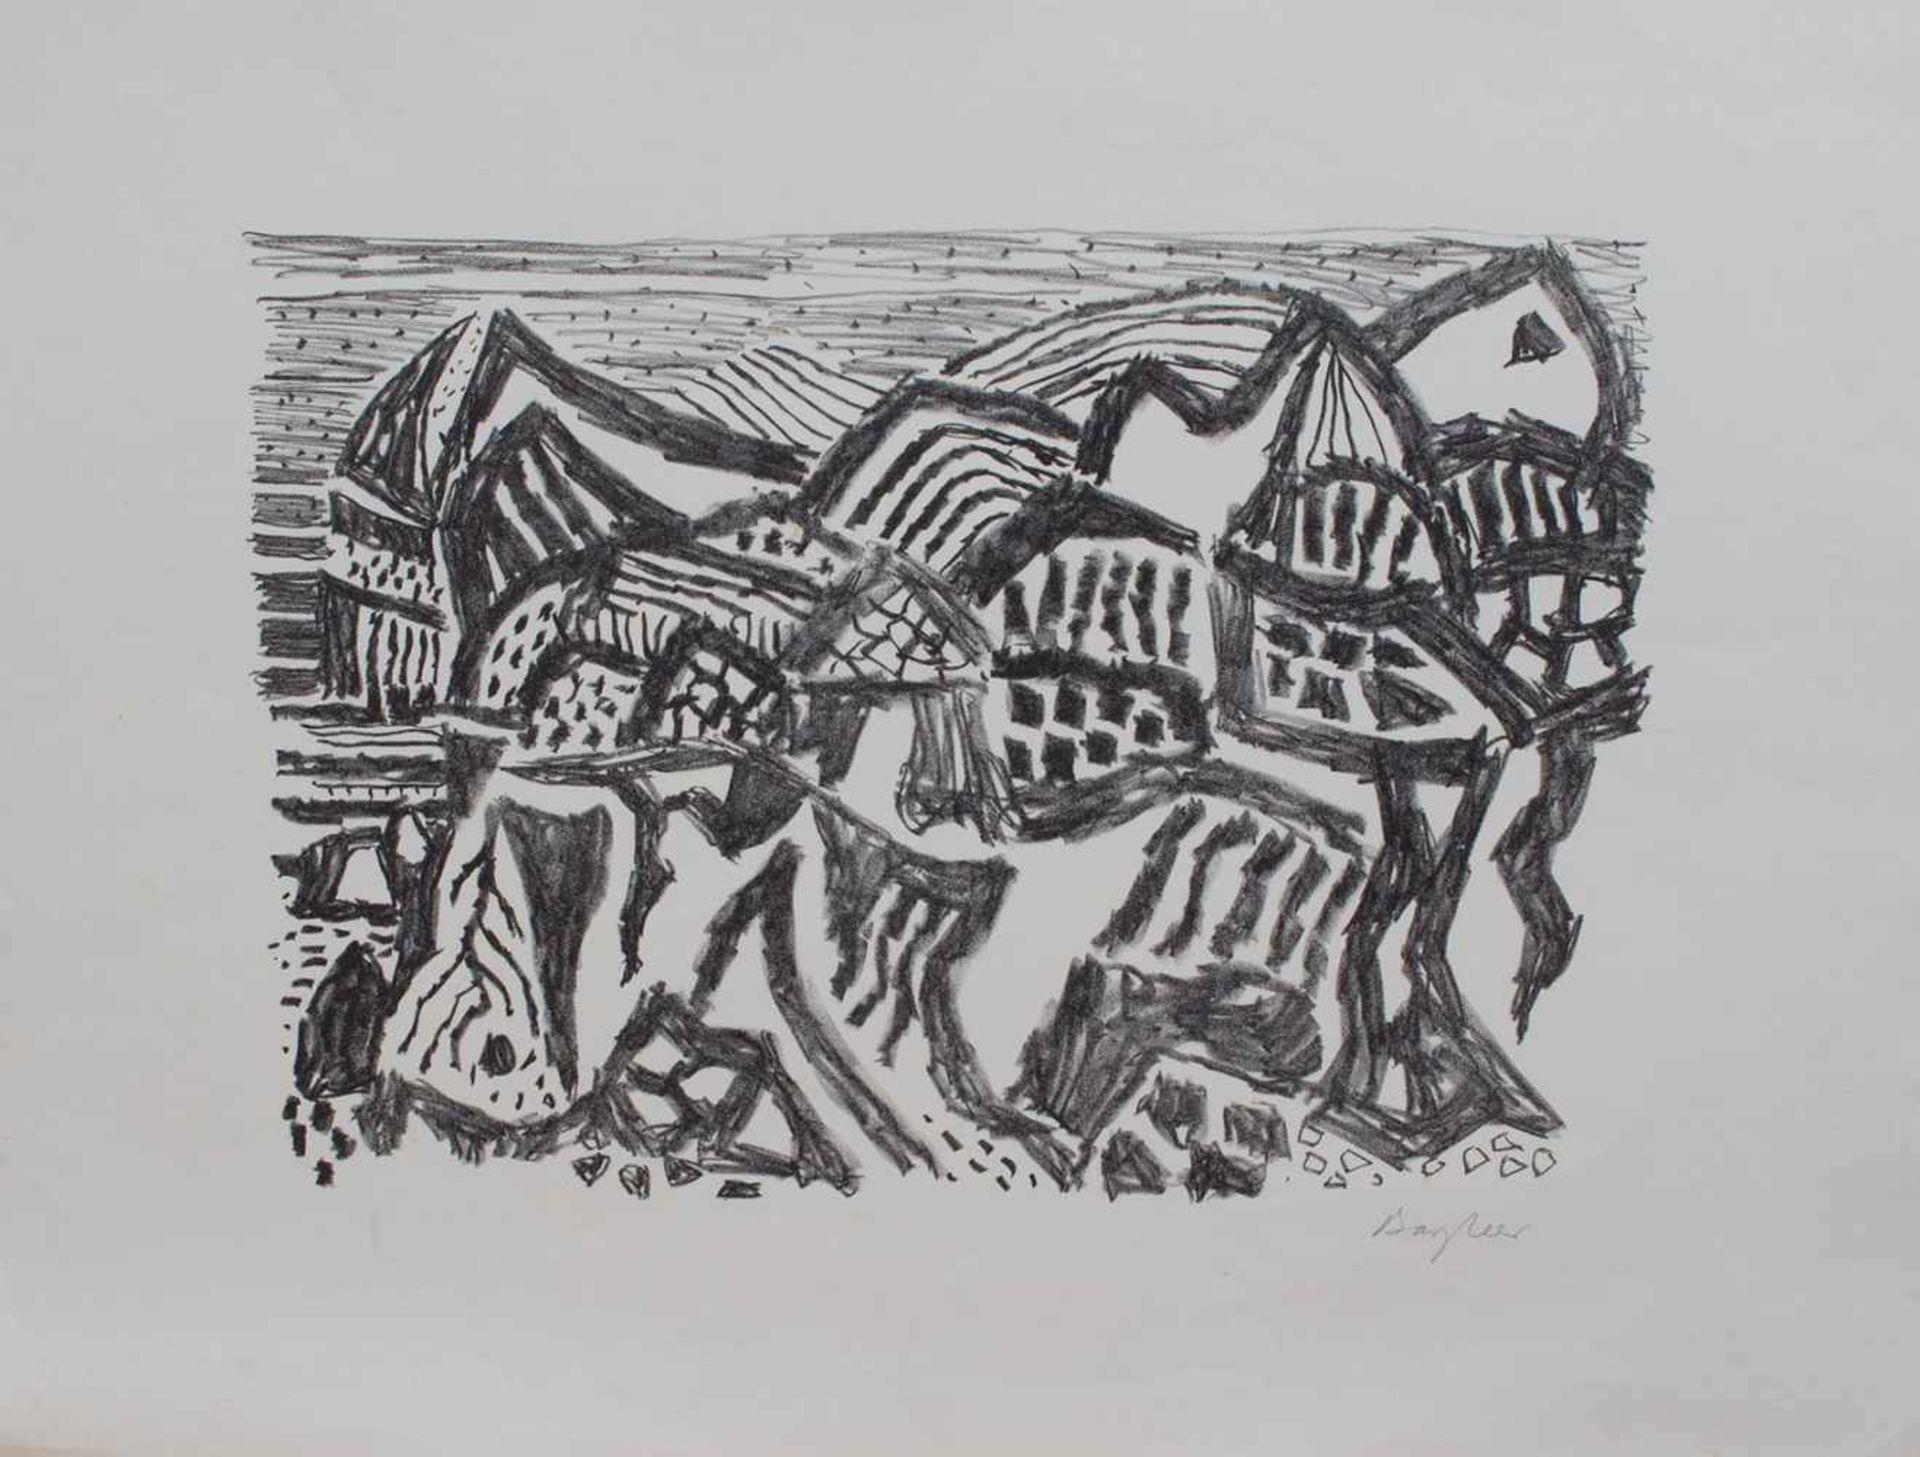 Los 1 - Eduard Bargheer (Hamburg 1901 - 1979 ebenda, Maler u. Graphiker, Vertreter d. klassischen Moderne,